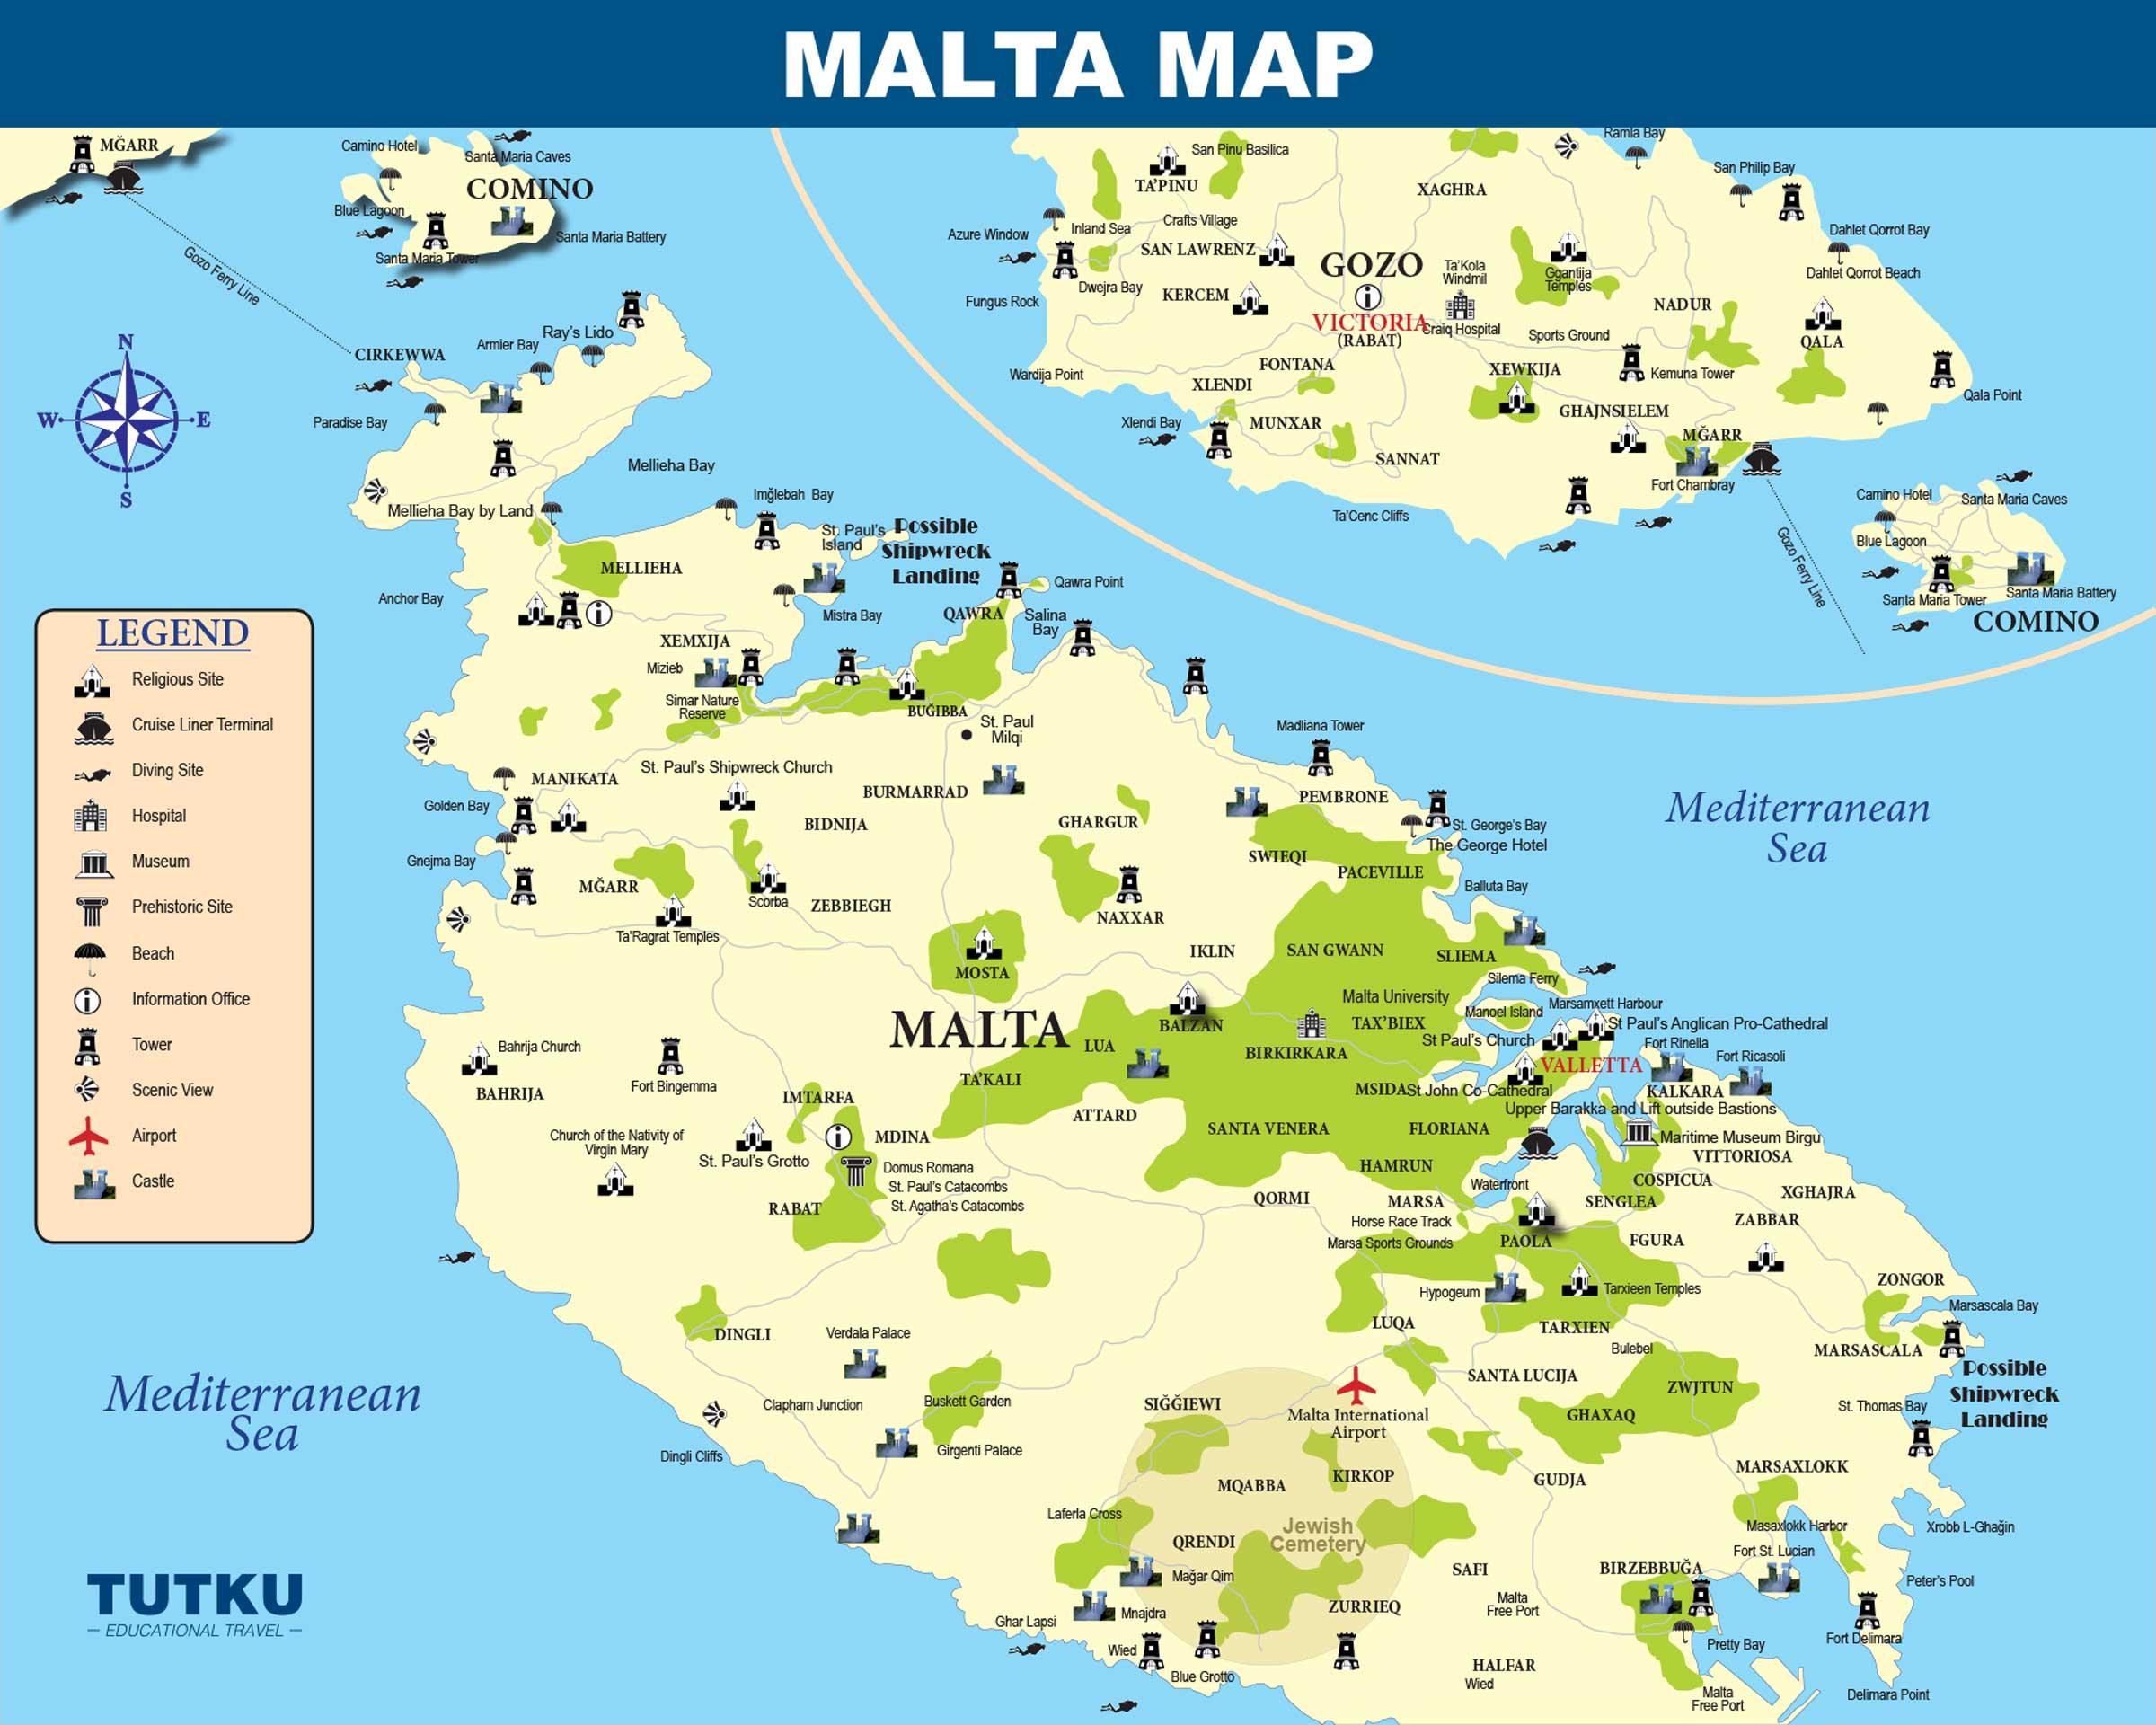 TUTKU TOURS - MAPS - Turkey Maps, Italy Map, Greece Map, Israel Map ...